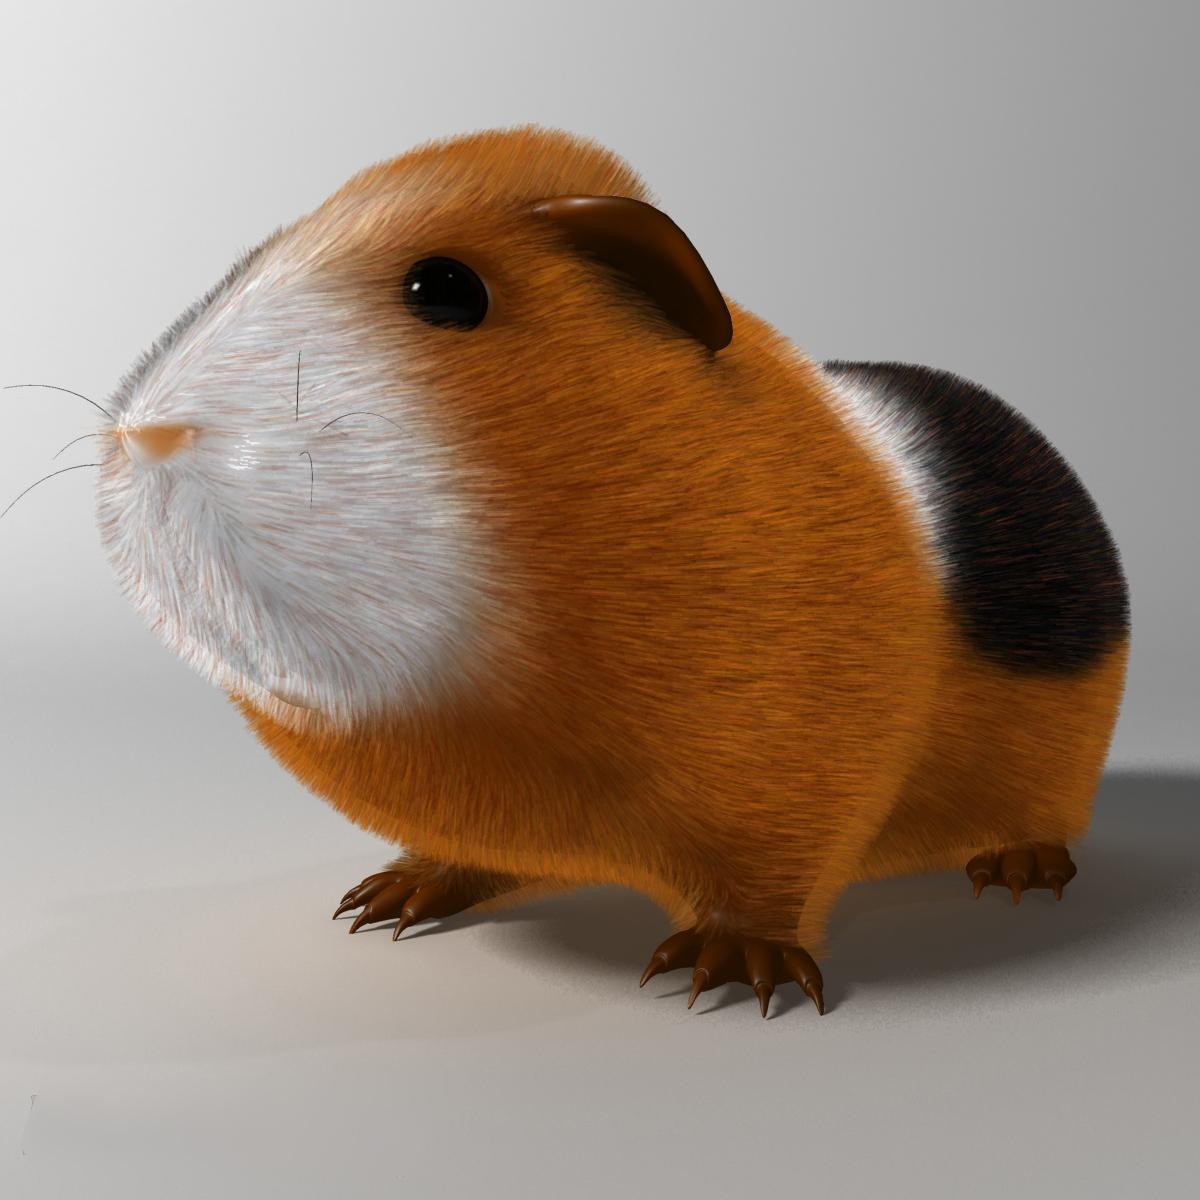 Guinea pig (Cavia porcellus) Rigged 3d model 3ds max fbx  obj 217060